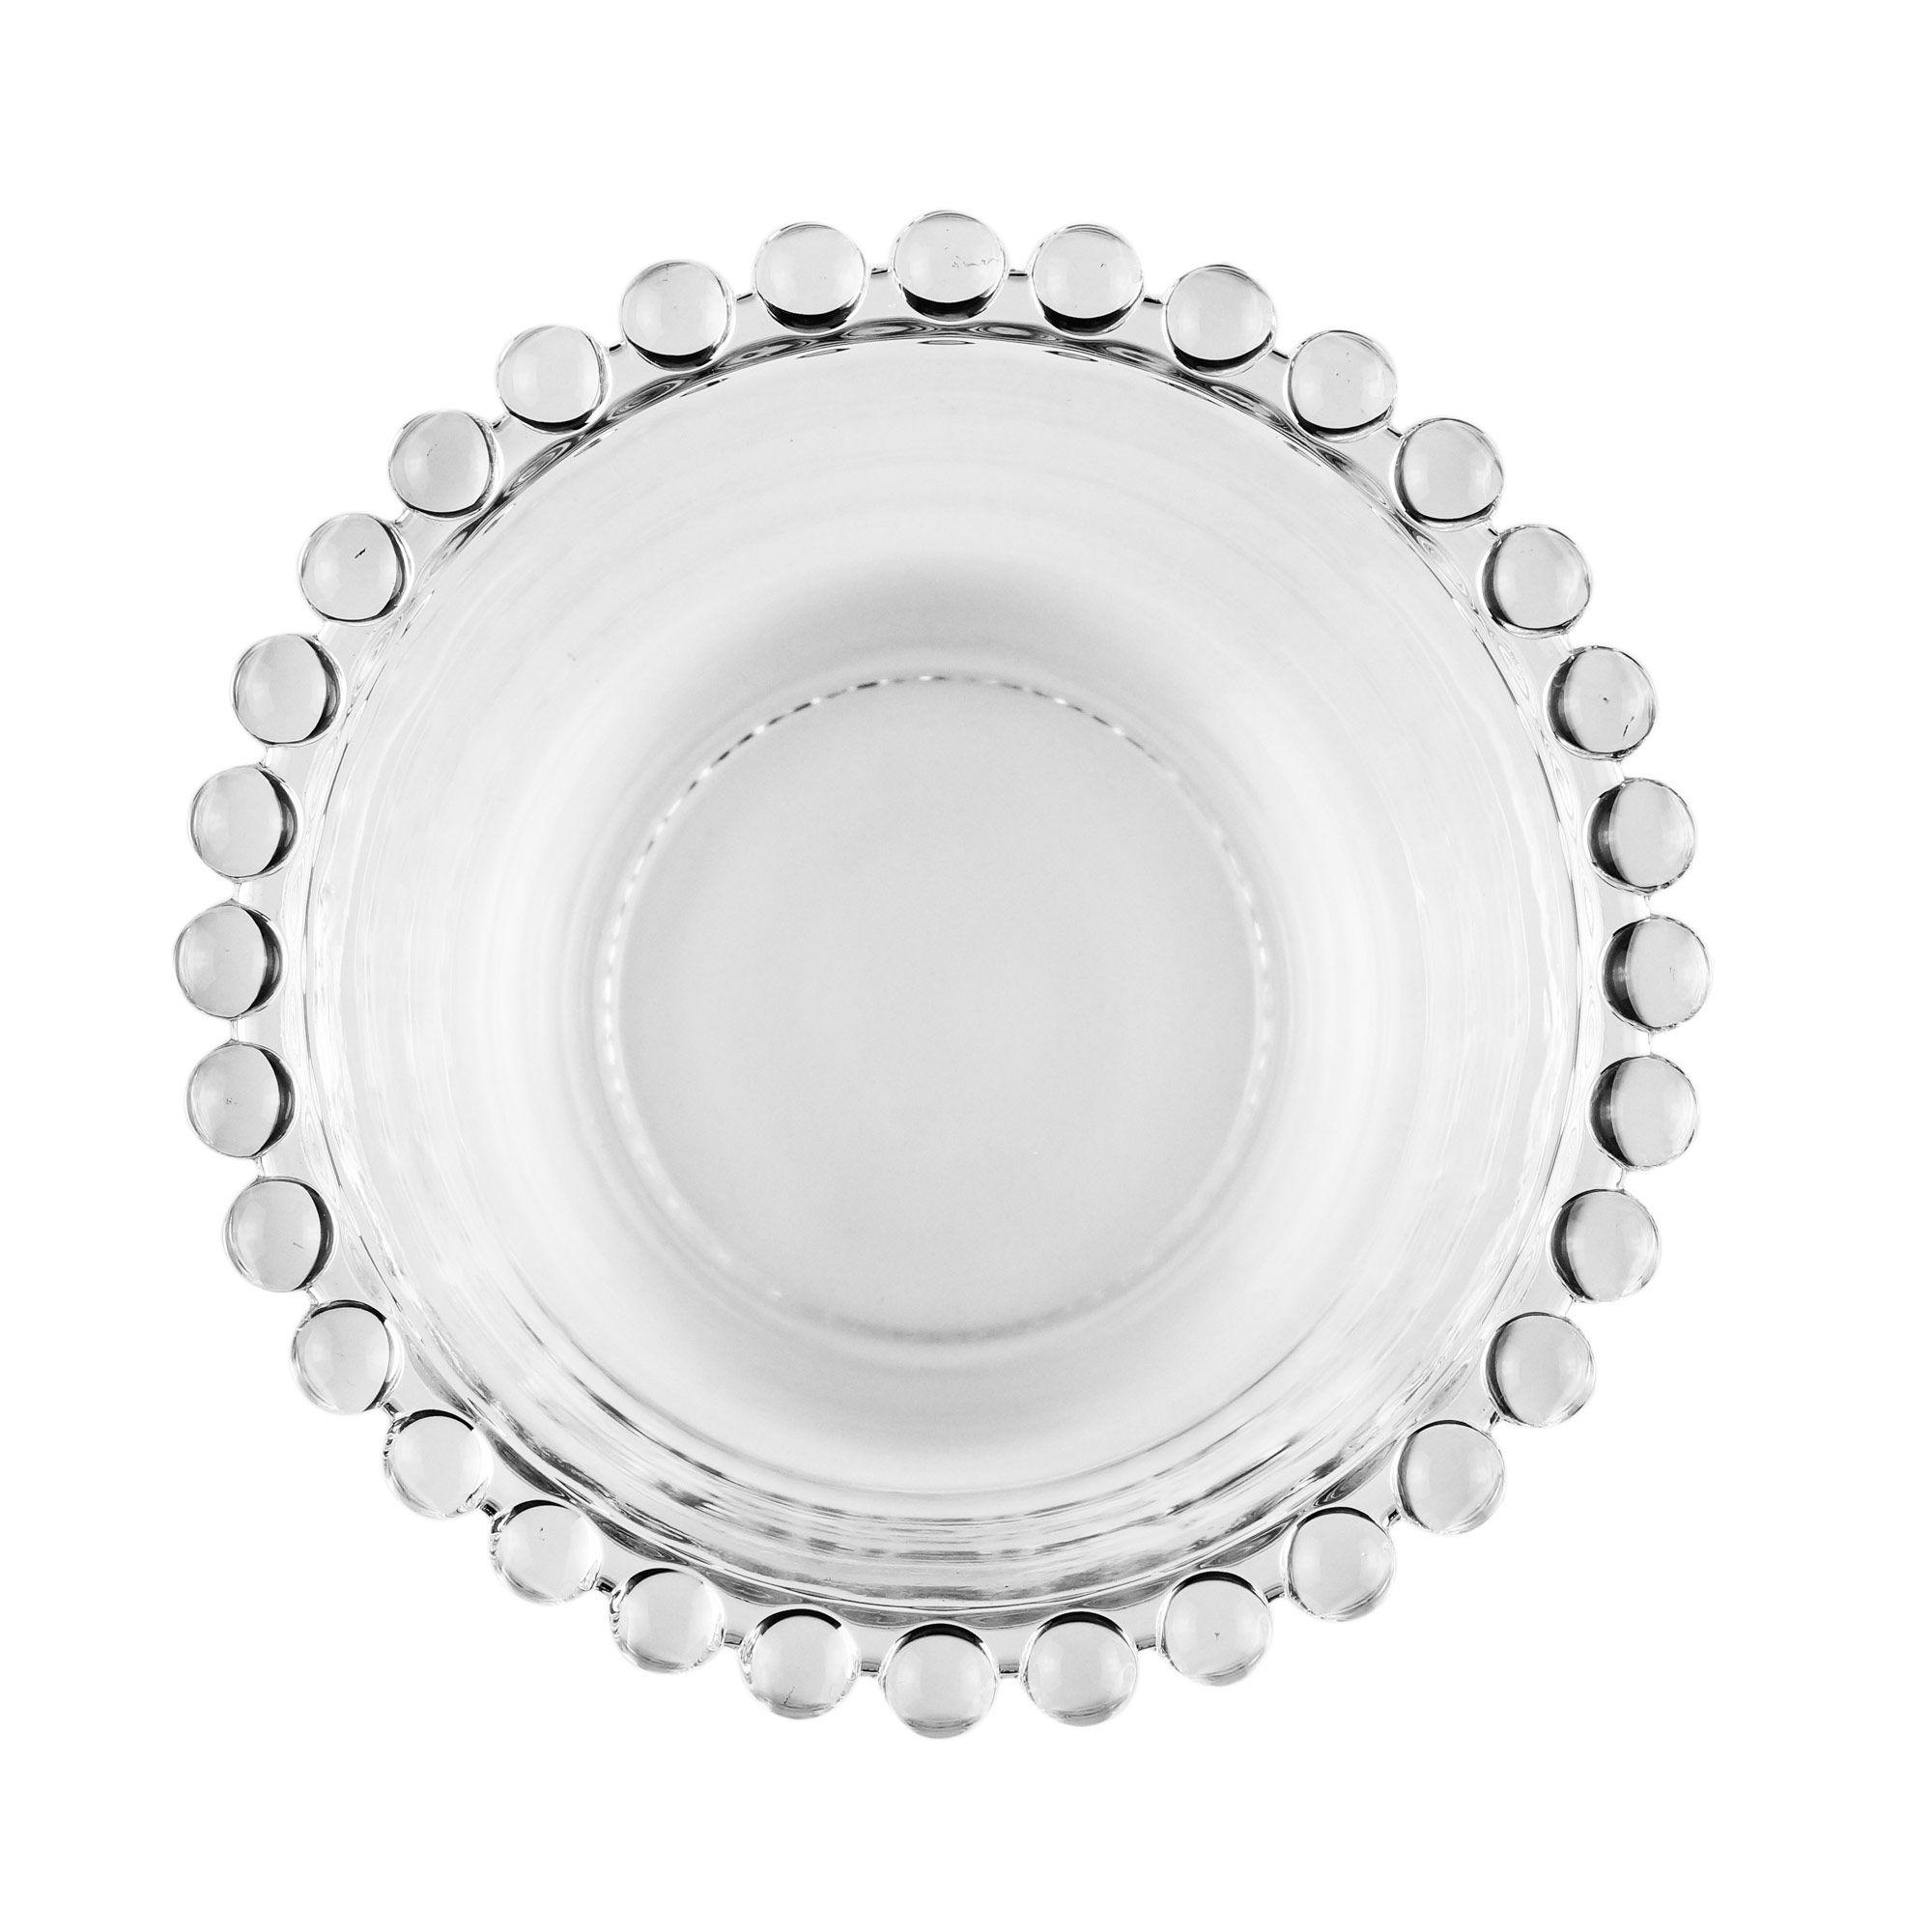 Jogo 4 bowls 12 cm para sobremesa de cristal transparente Pearl Wolff - 27894